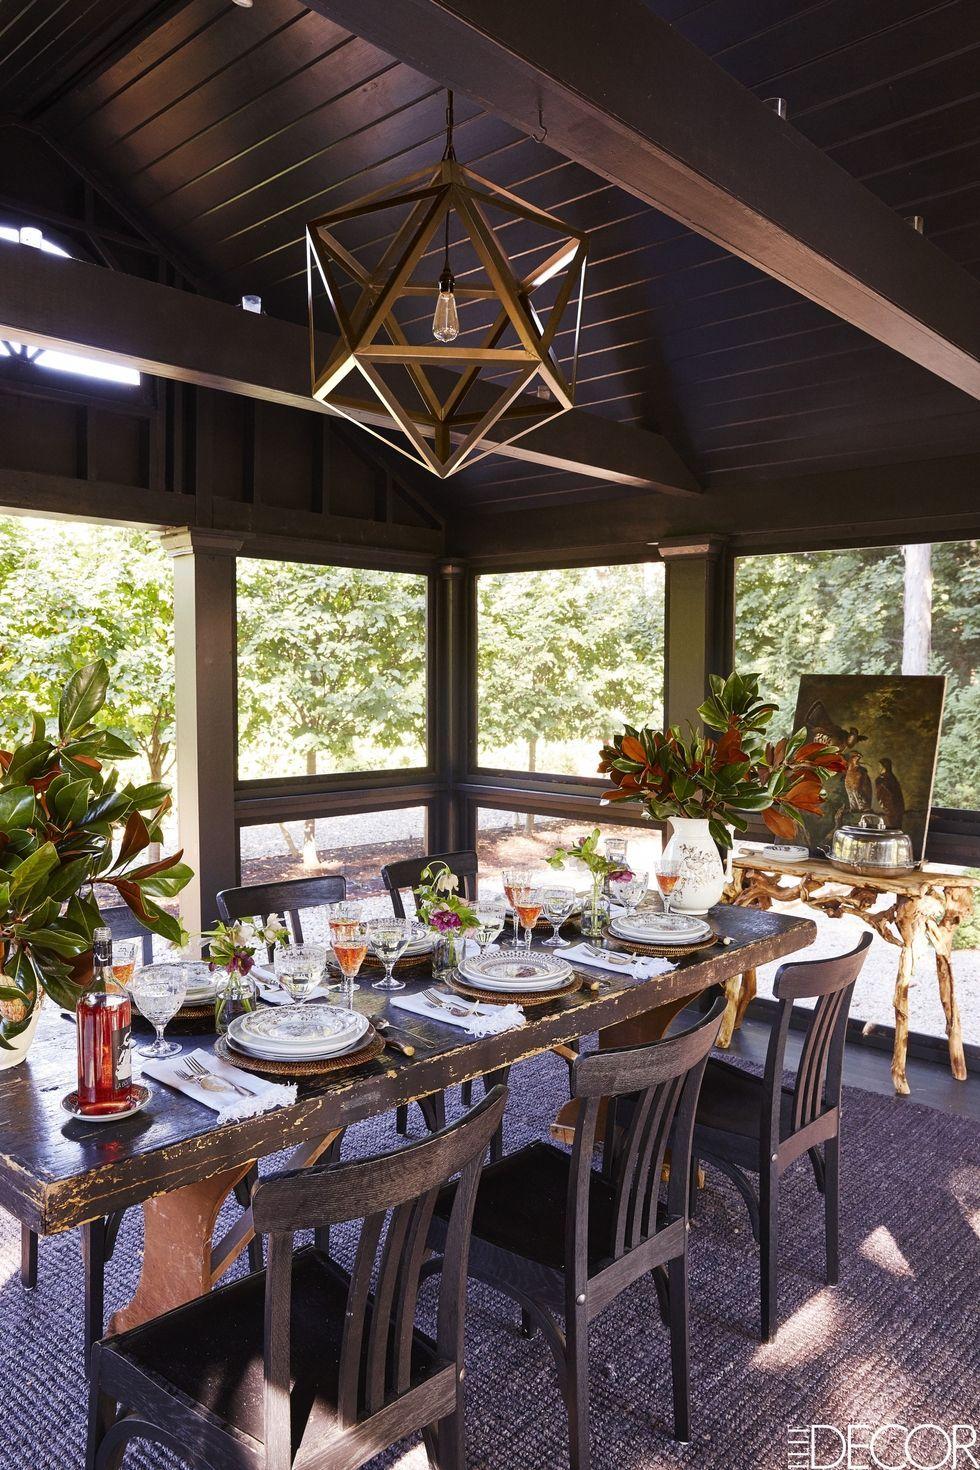 40 Best Small Patio Ideas - Small Patio Furniture & Design on Small Backyard Patio Designs id=23679